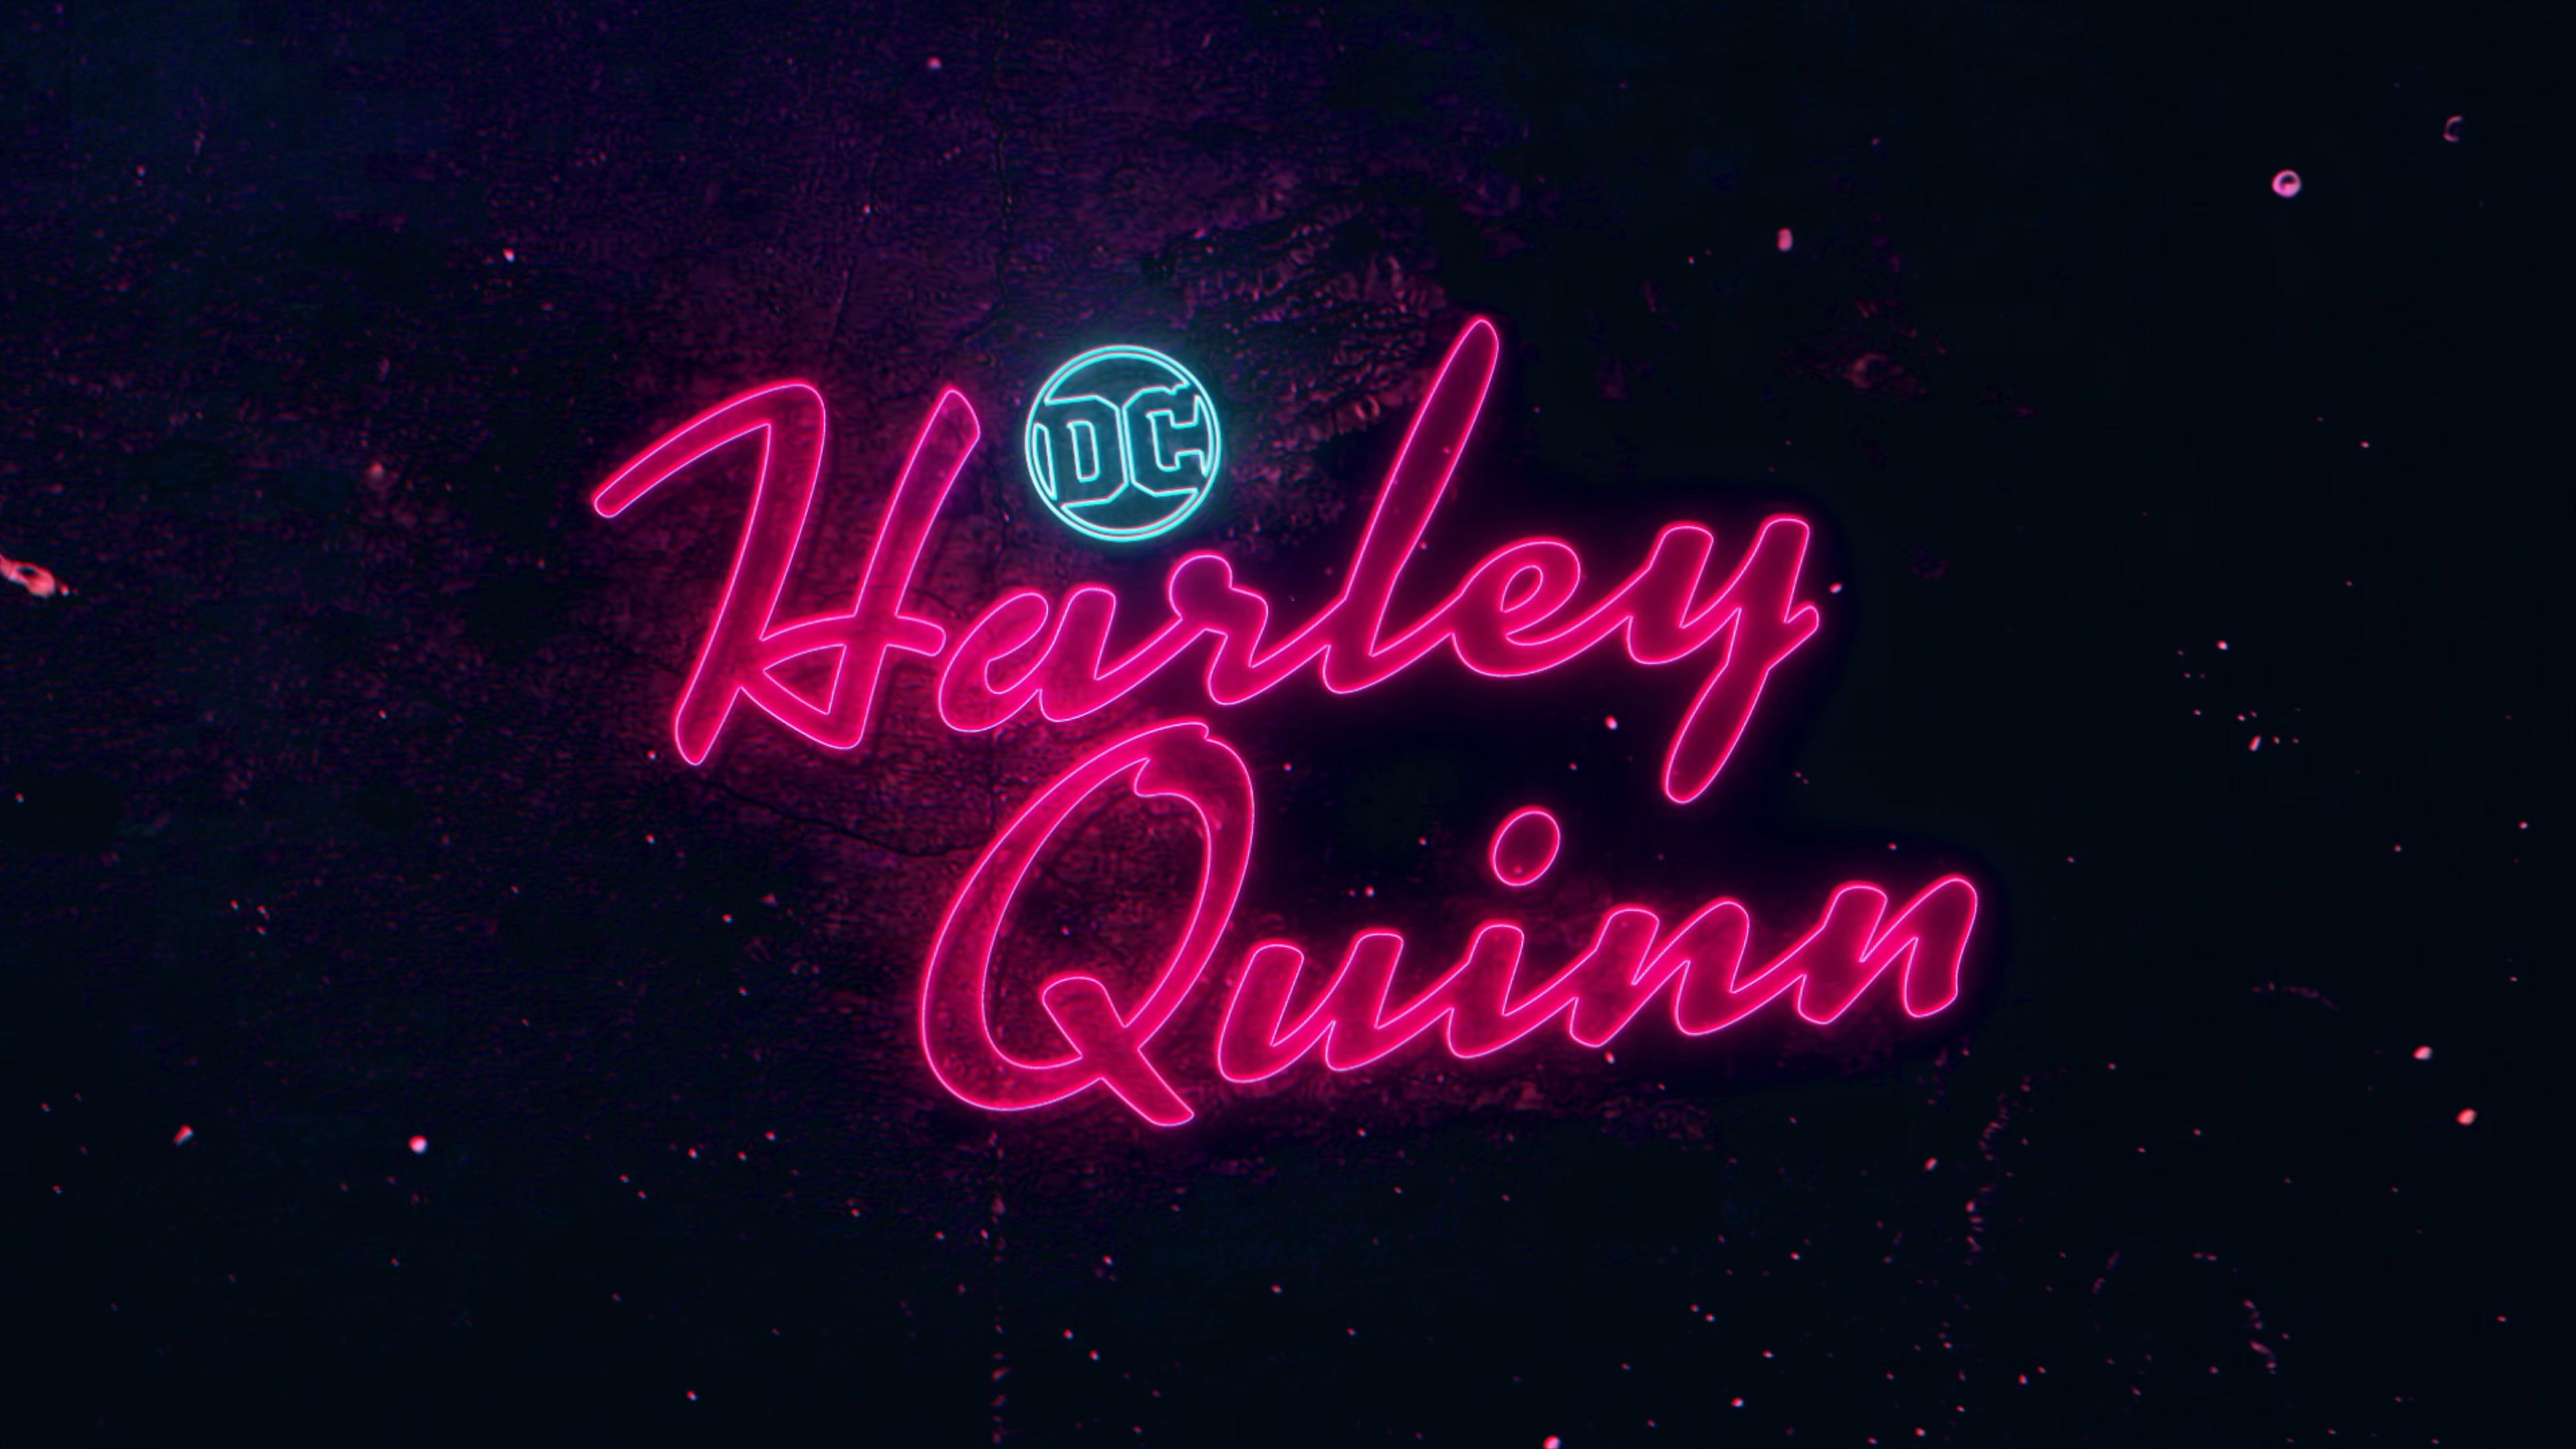 Harley.Quinn.S01E08.2160p.WEB.H265-METCON – 1.8 GB – HDEncode.com ...